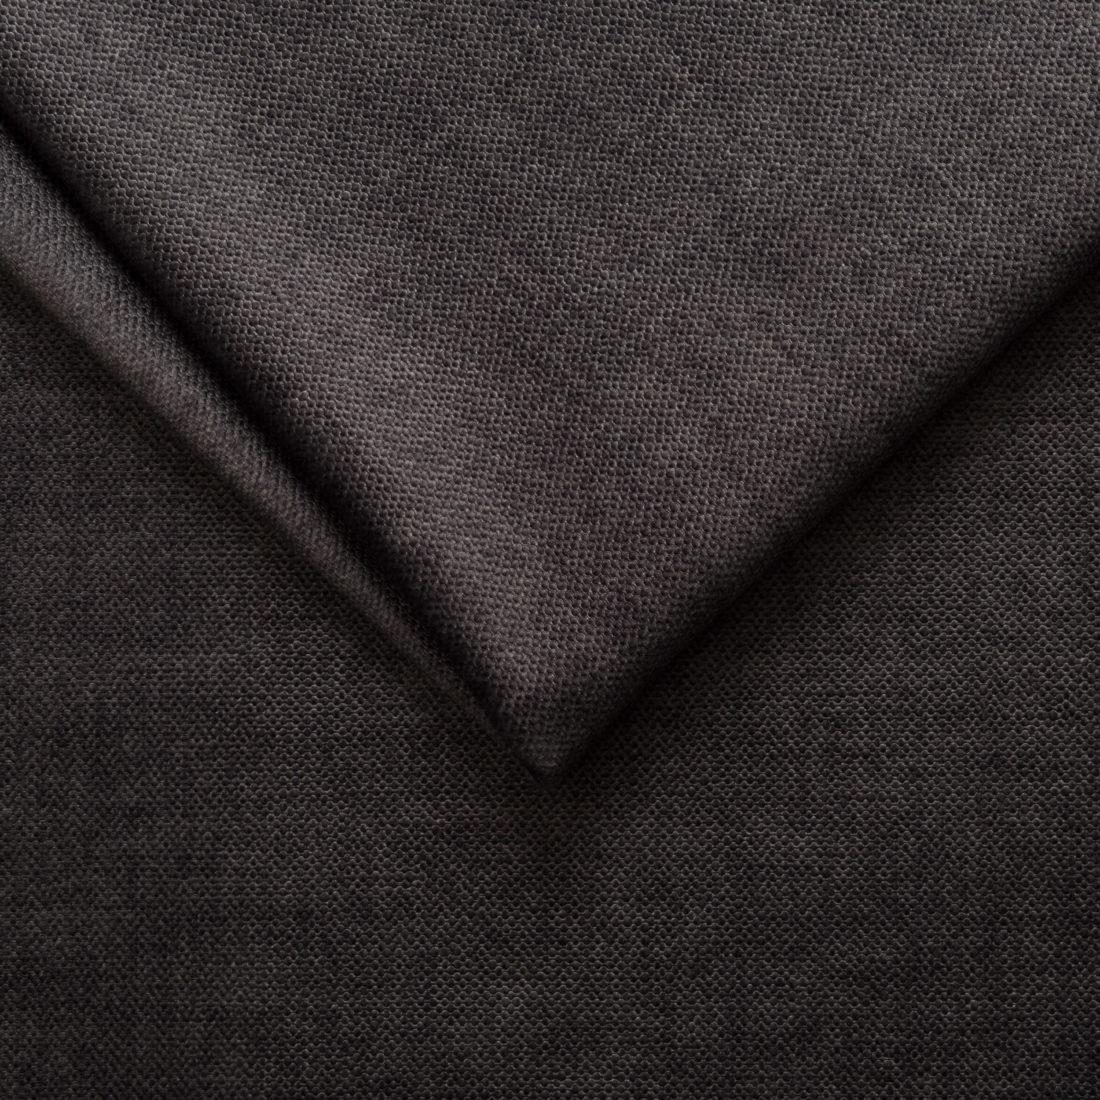 Мебельная ткань Vogue 16 Graphite, велюр